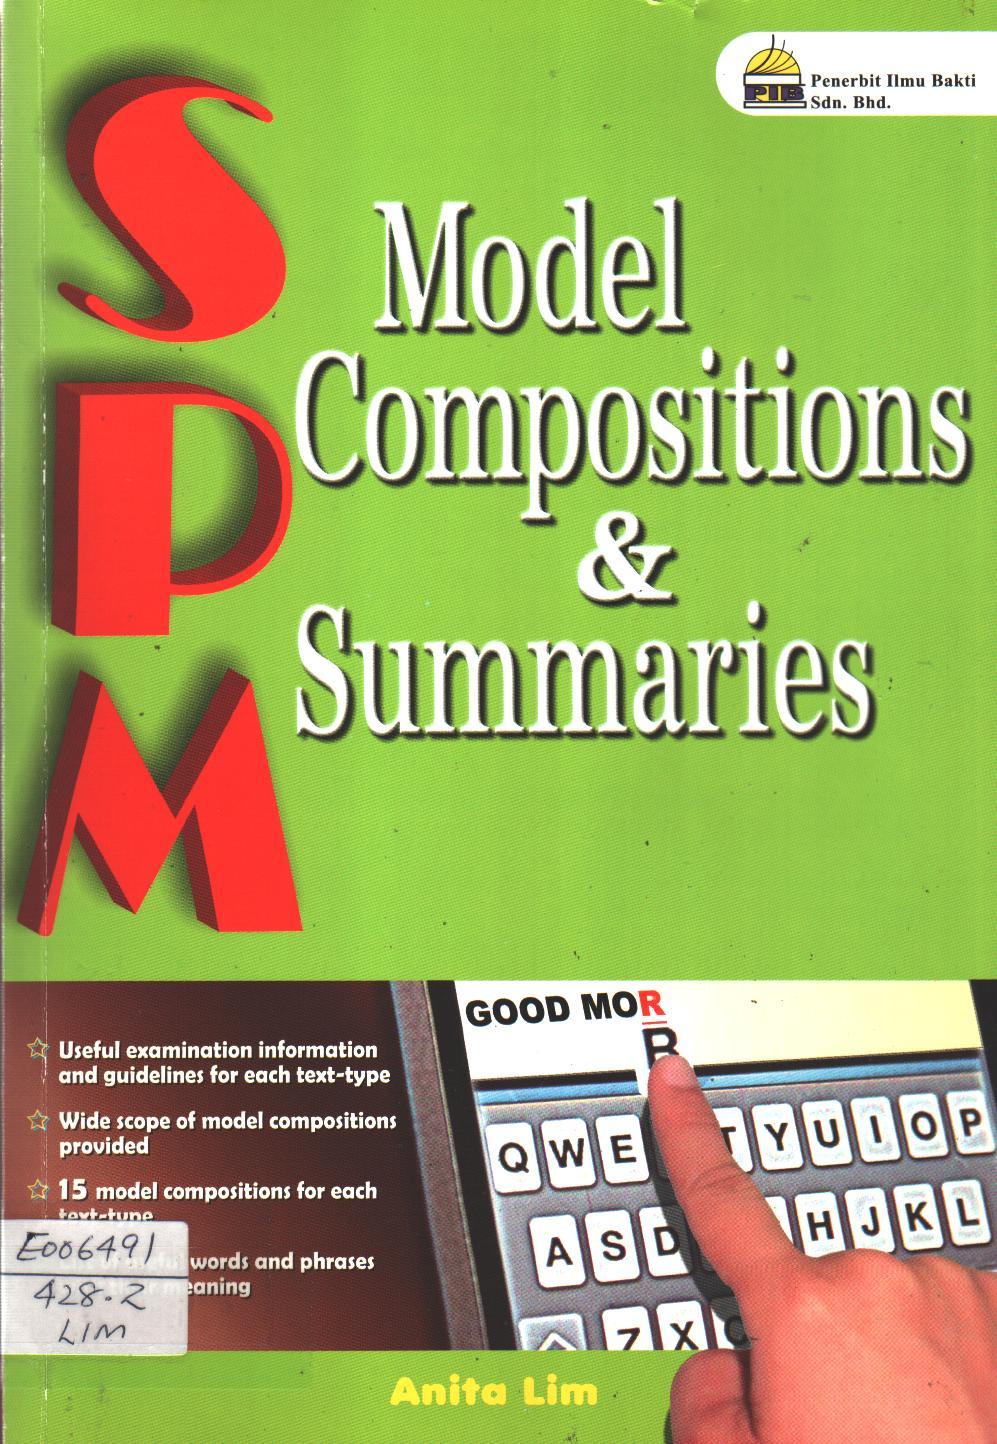 SPM Model Compositions & Summaries